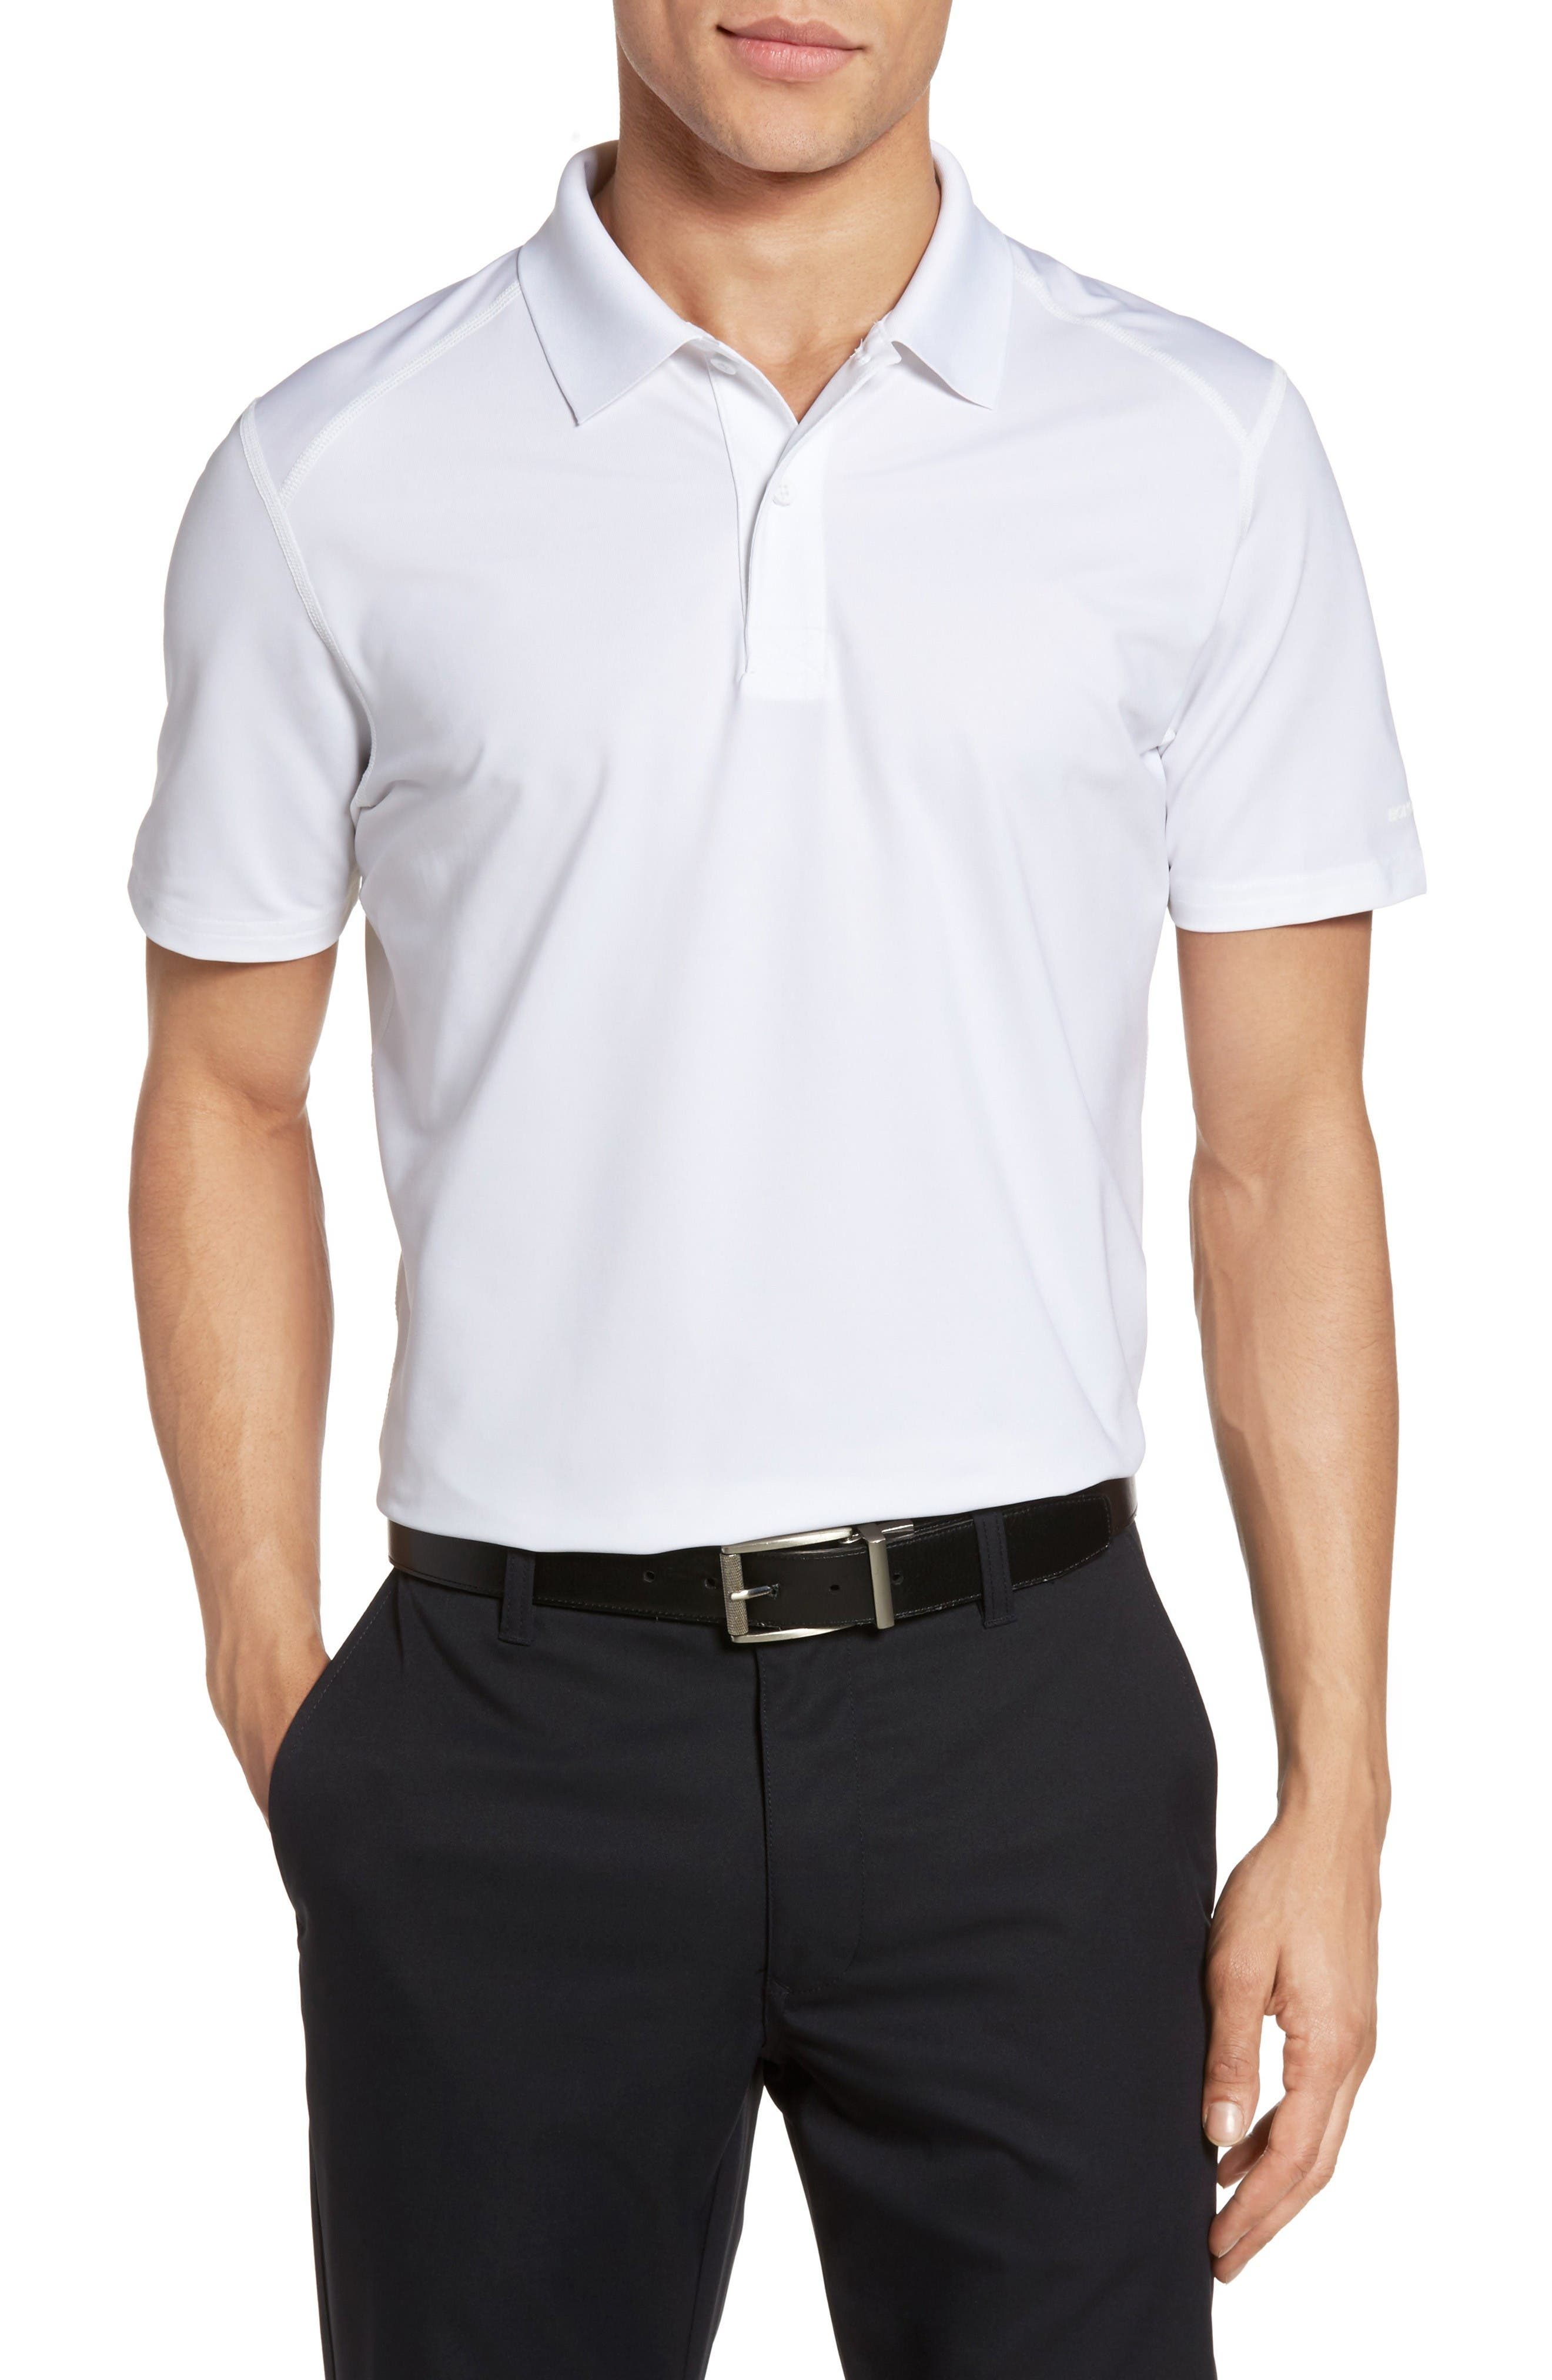 Main Image - Bonobos M-Flex Flatiron Slim Fit Golf Polo